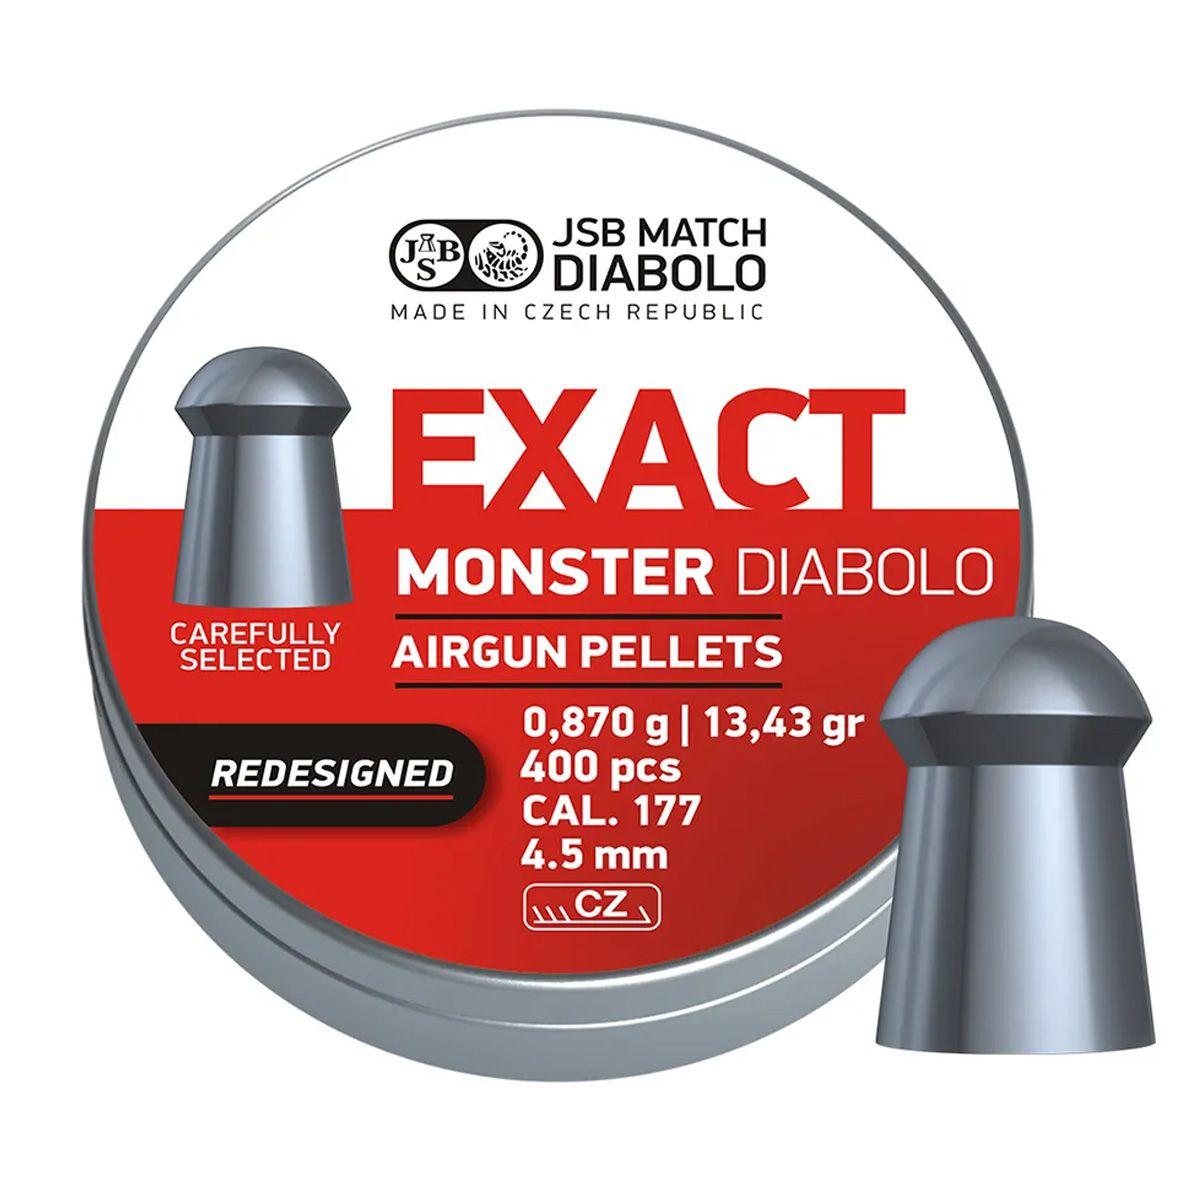 Chumbinho Jsb Exact Monter Diabolo 4.5mm 400un. 13,43gr